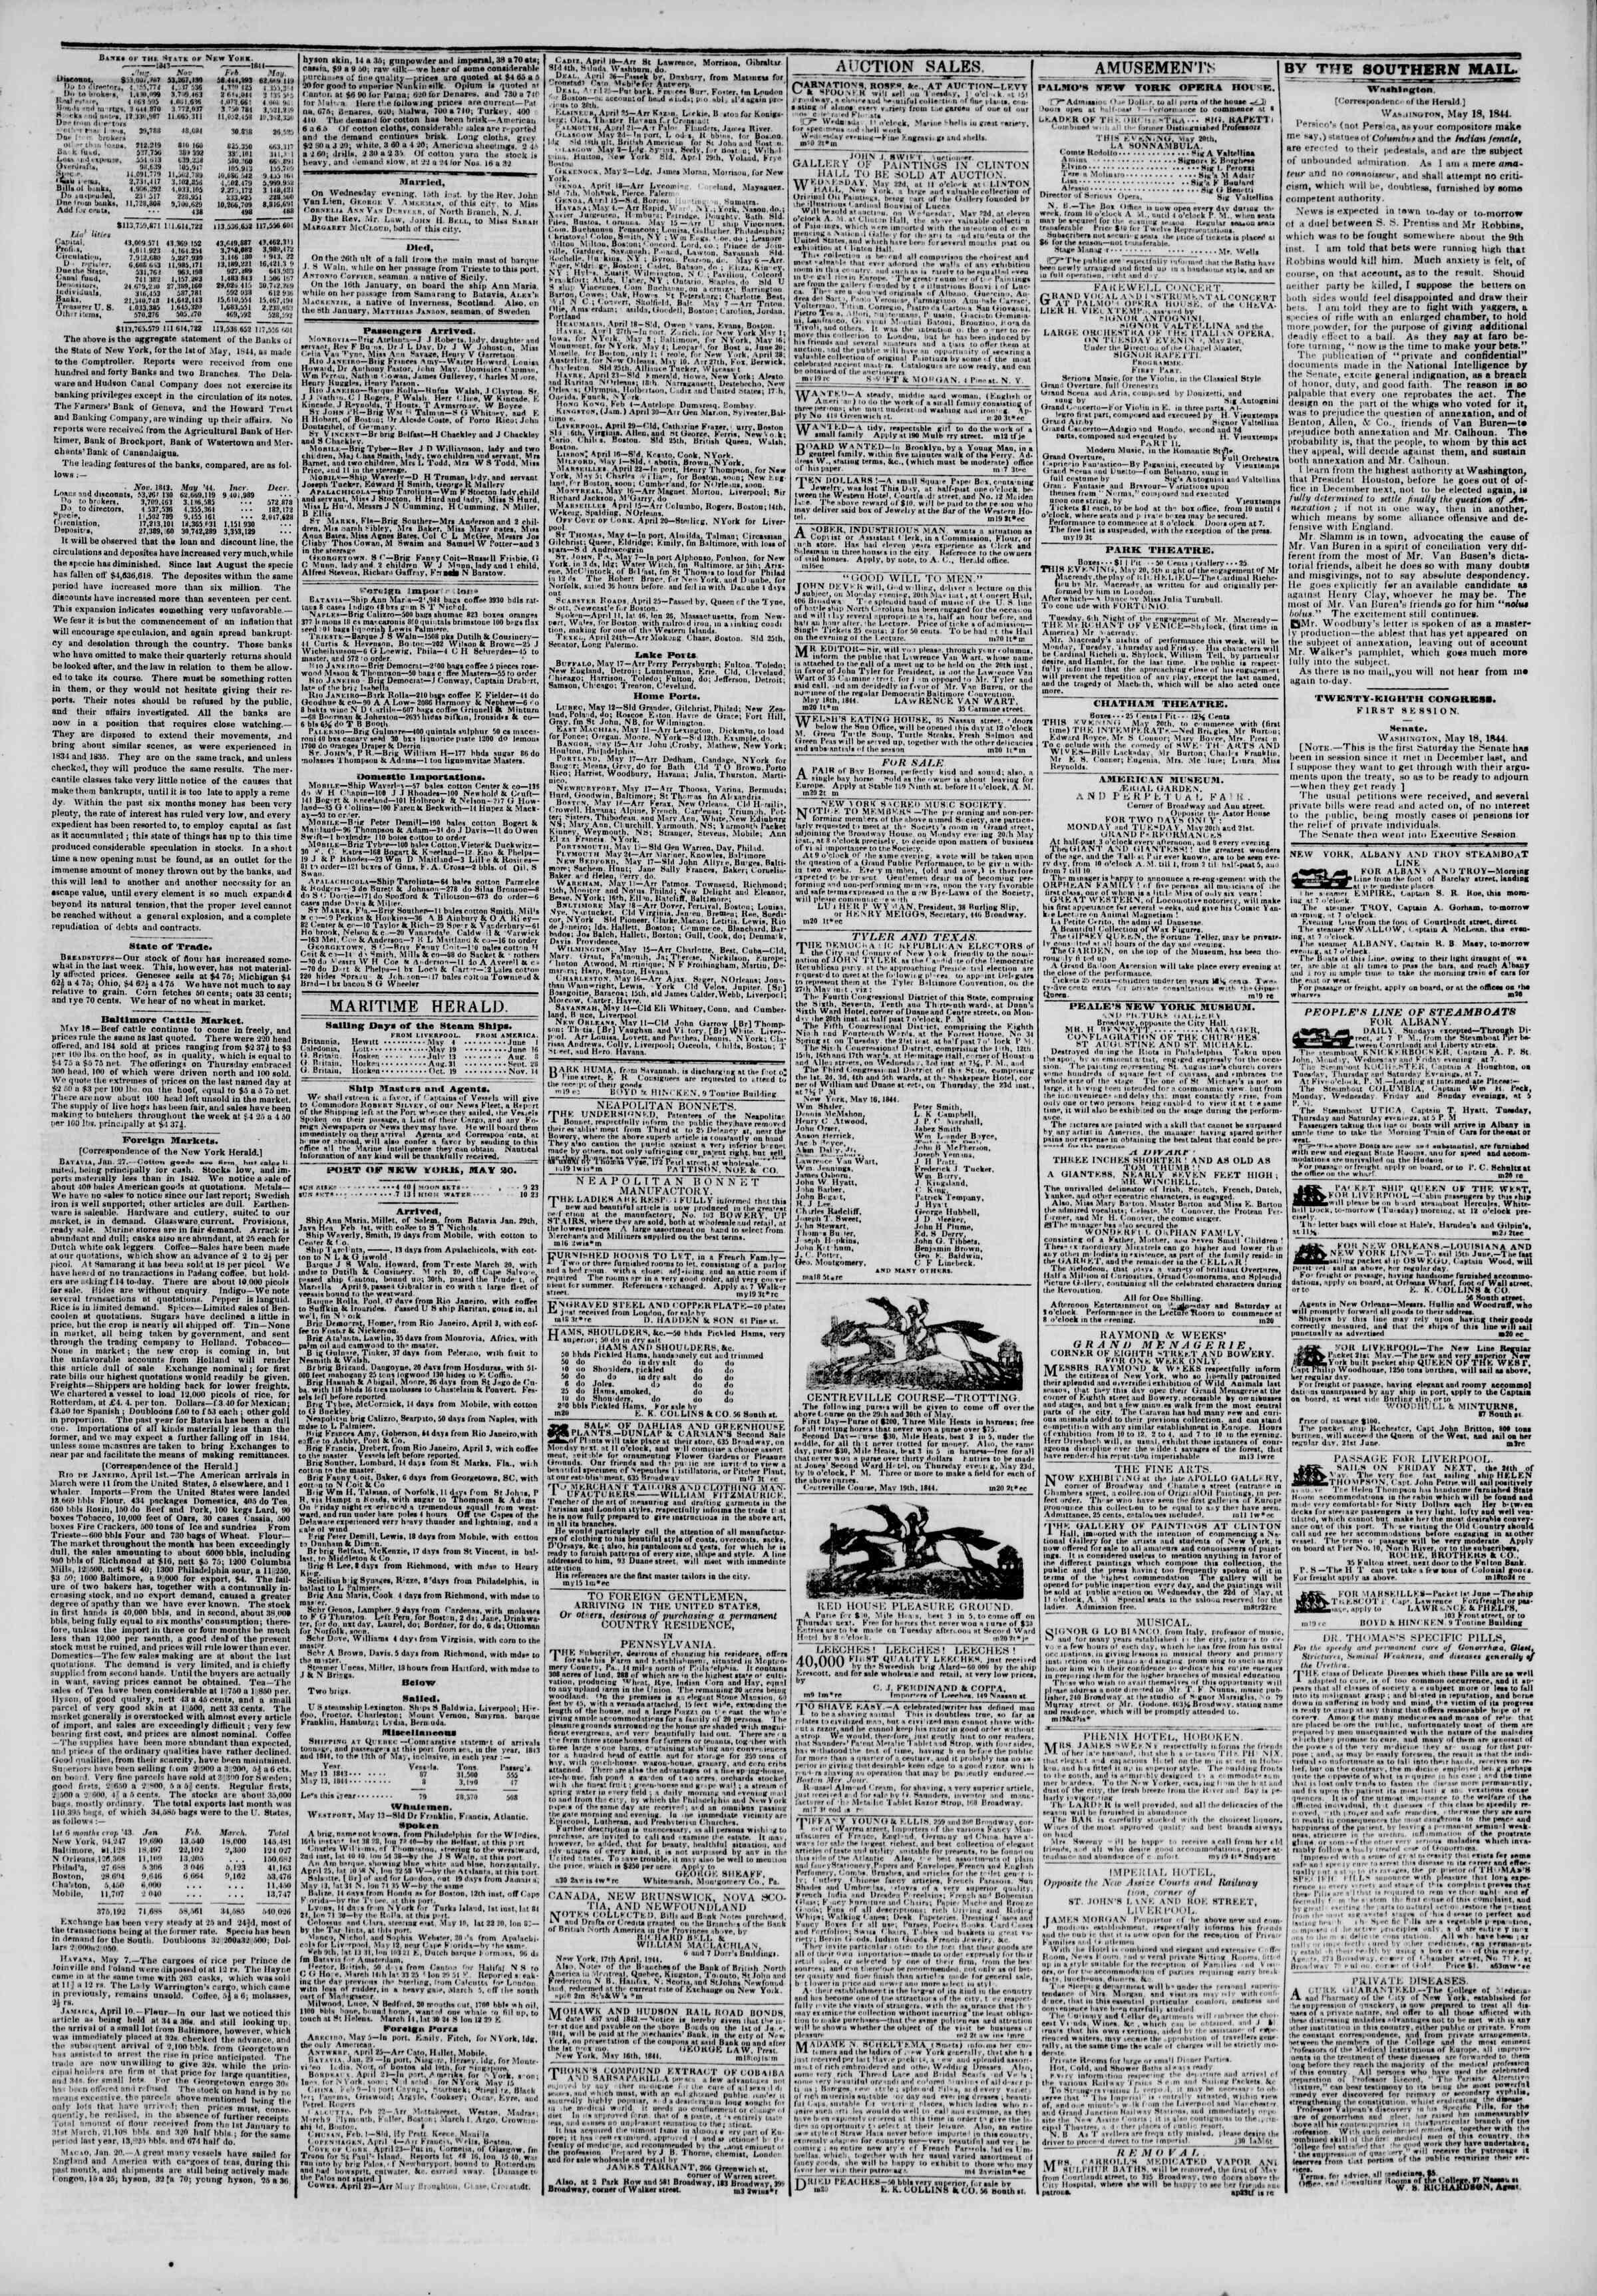 May 20, 1844 Tarihli The New York Herald Gazetesi Sayfa 3